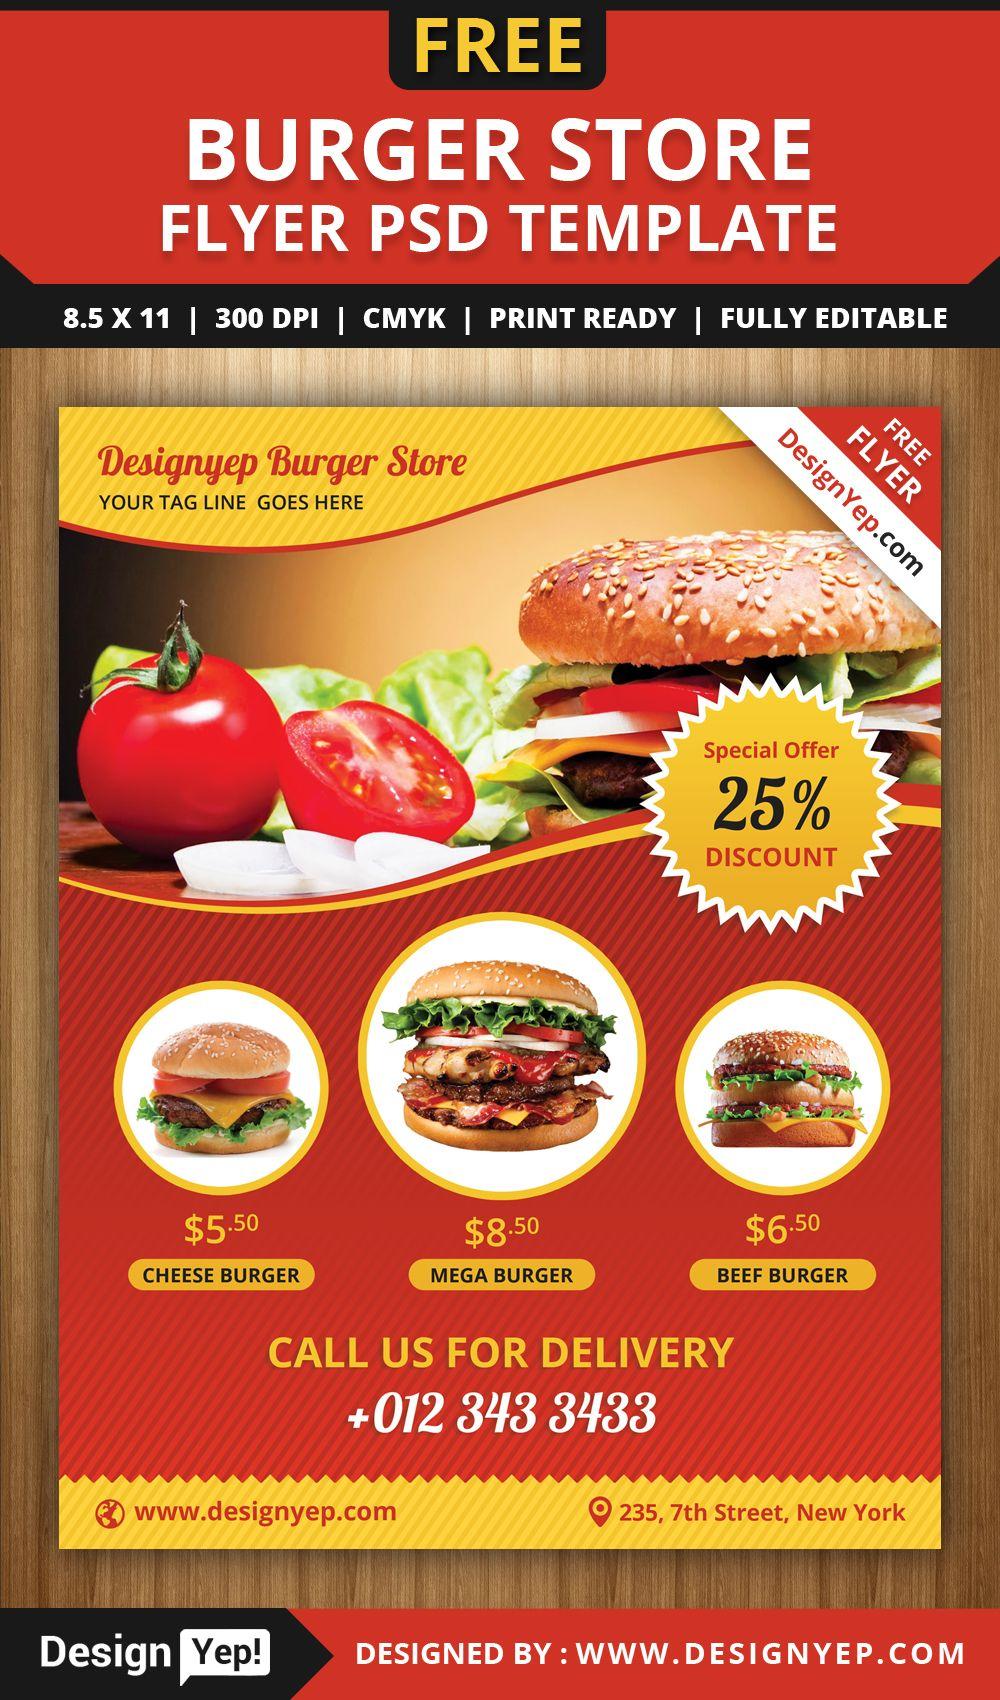 Free-Burger-Store-Flyer-PSD-Template-1988-DesingYep | Free Flyers ...